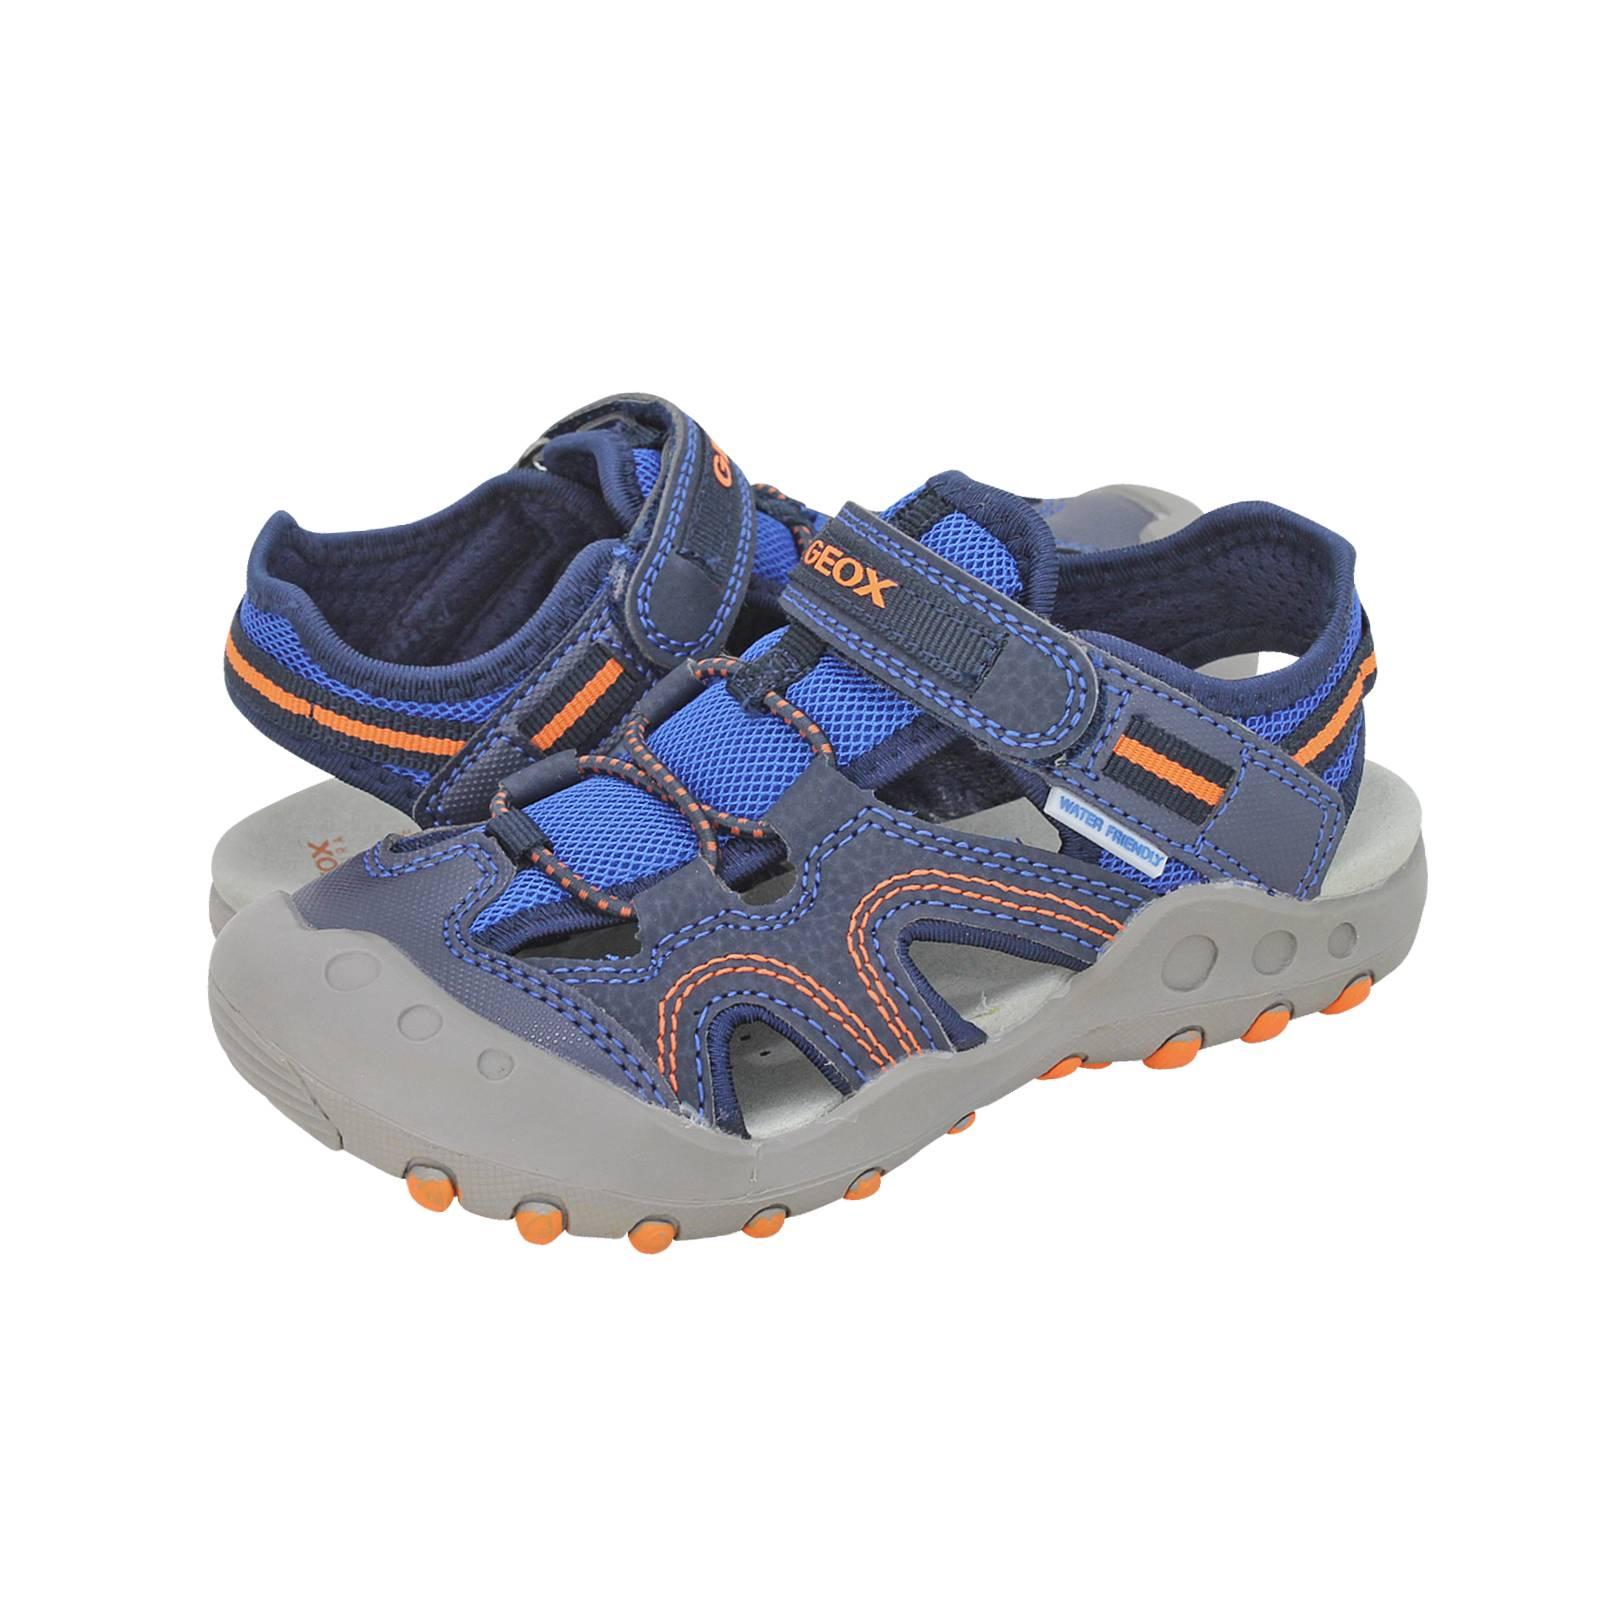 Geox J S.Kyle A kids' sandals